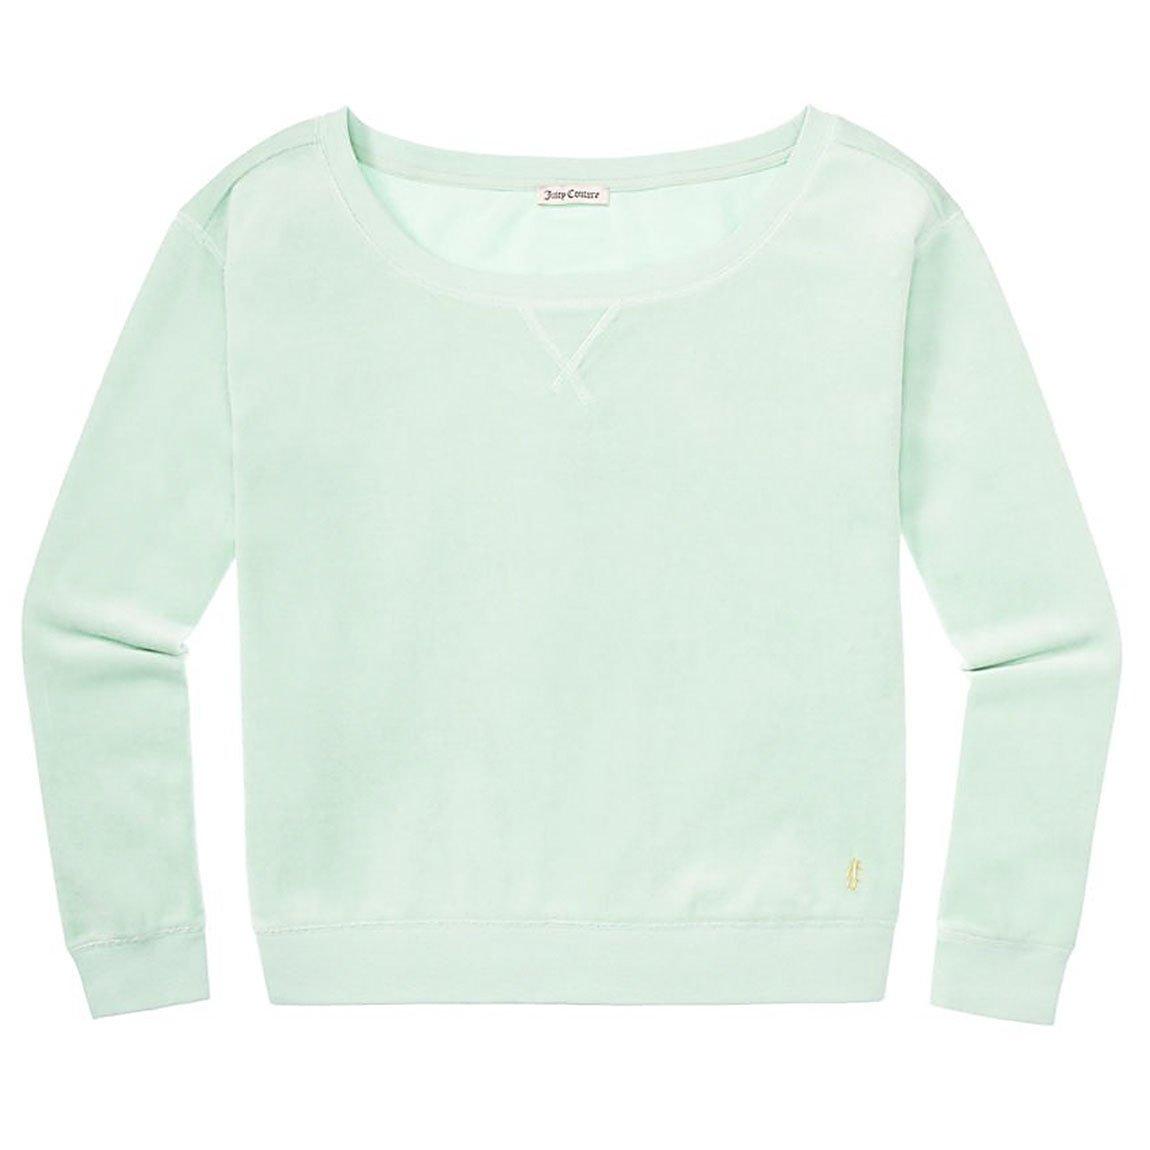 Juicy Couture Aqua Glass Velour Crew Neck Off The Shoulder Oversize Track Sweatshirt XL